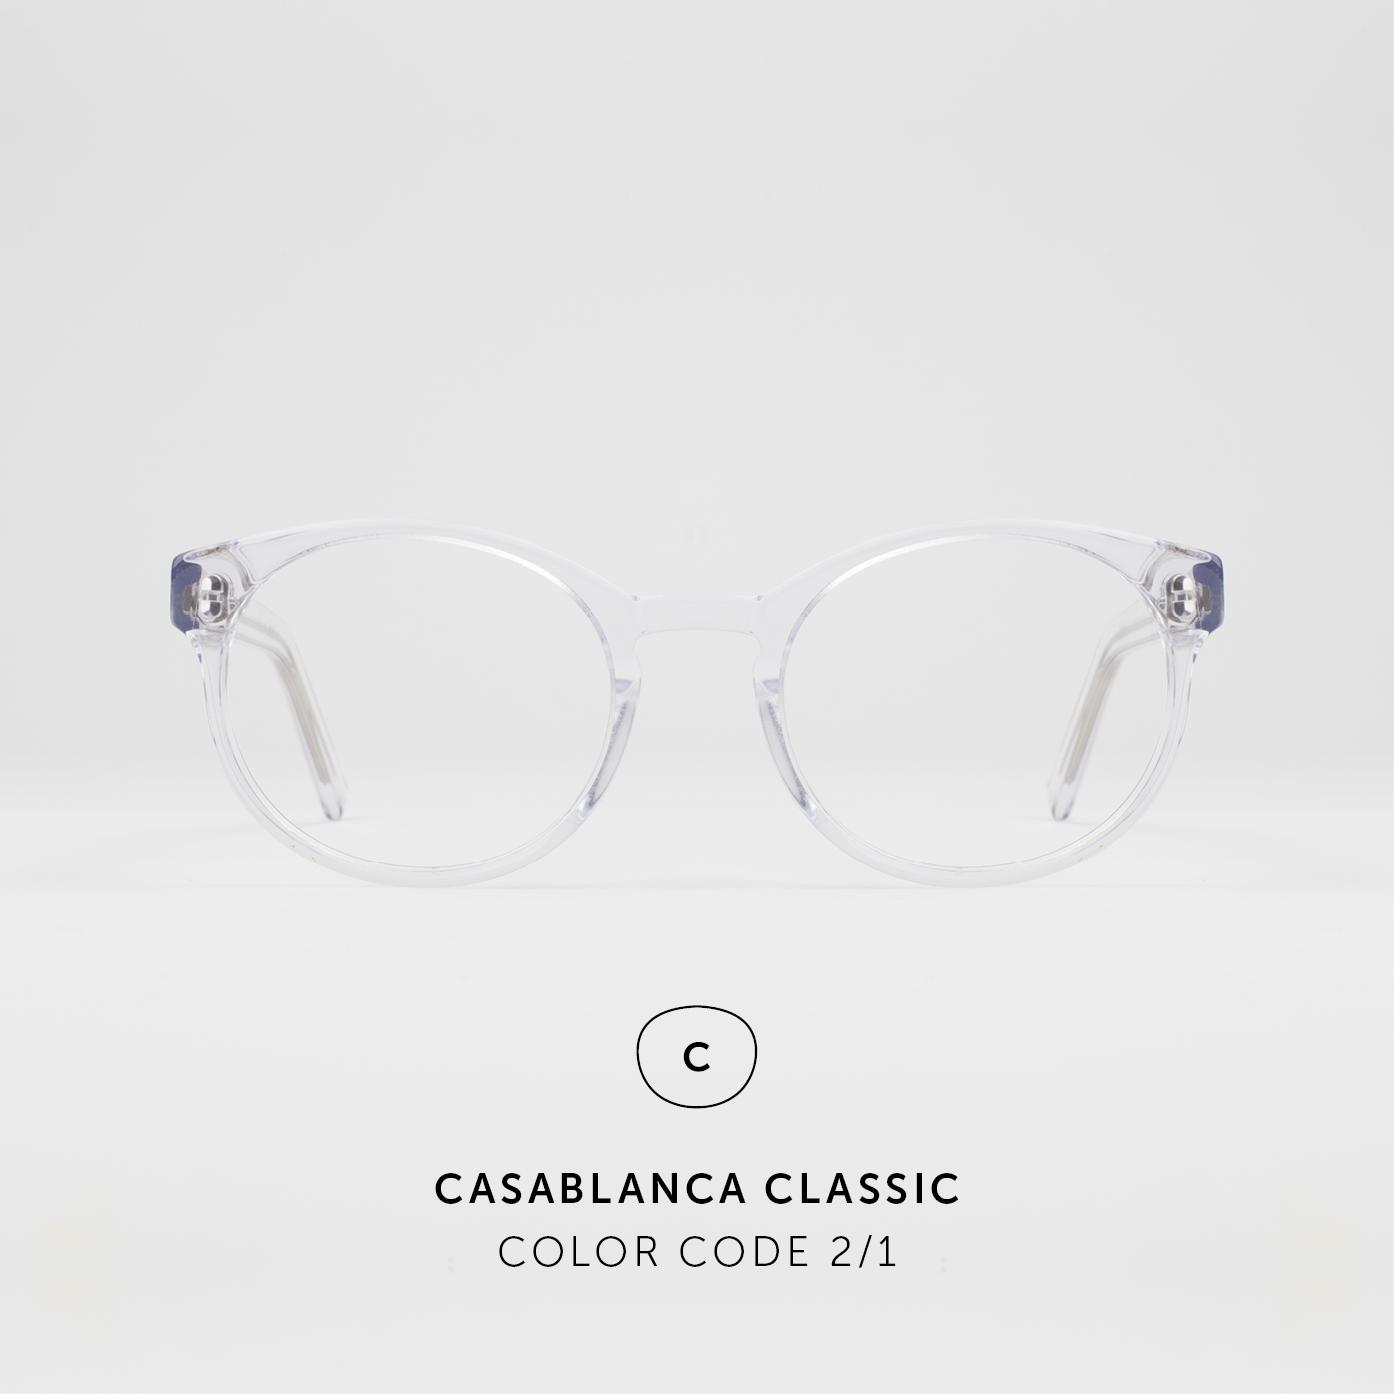 CasablancaClassic13.jpg